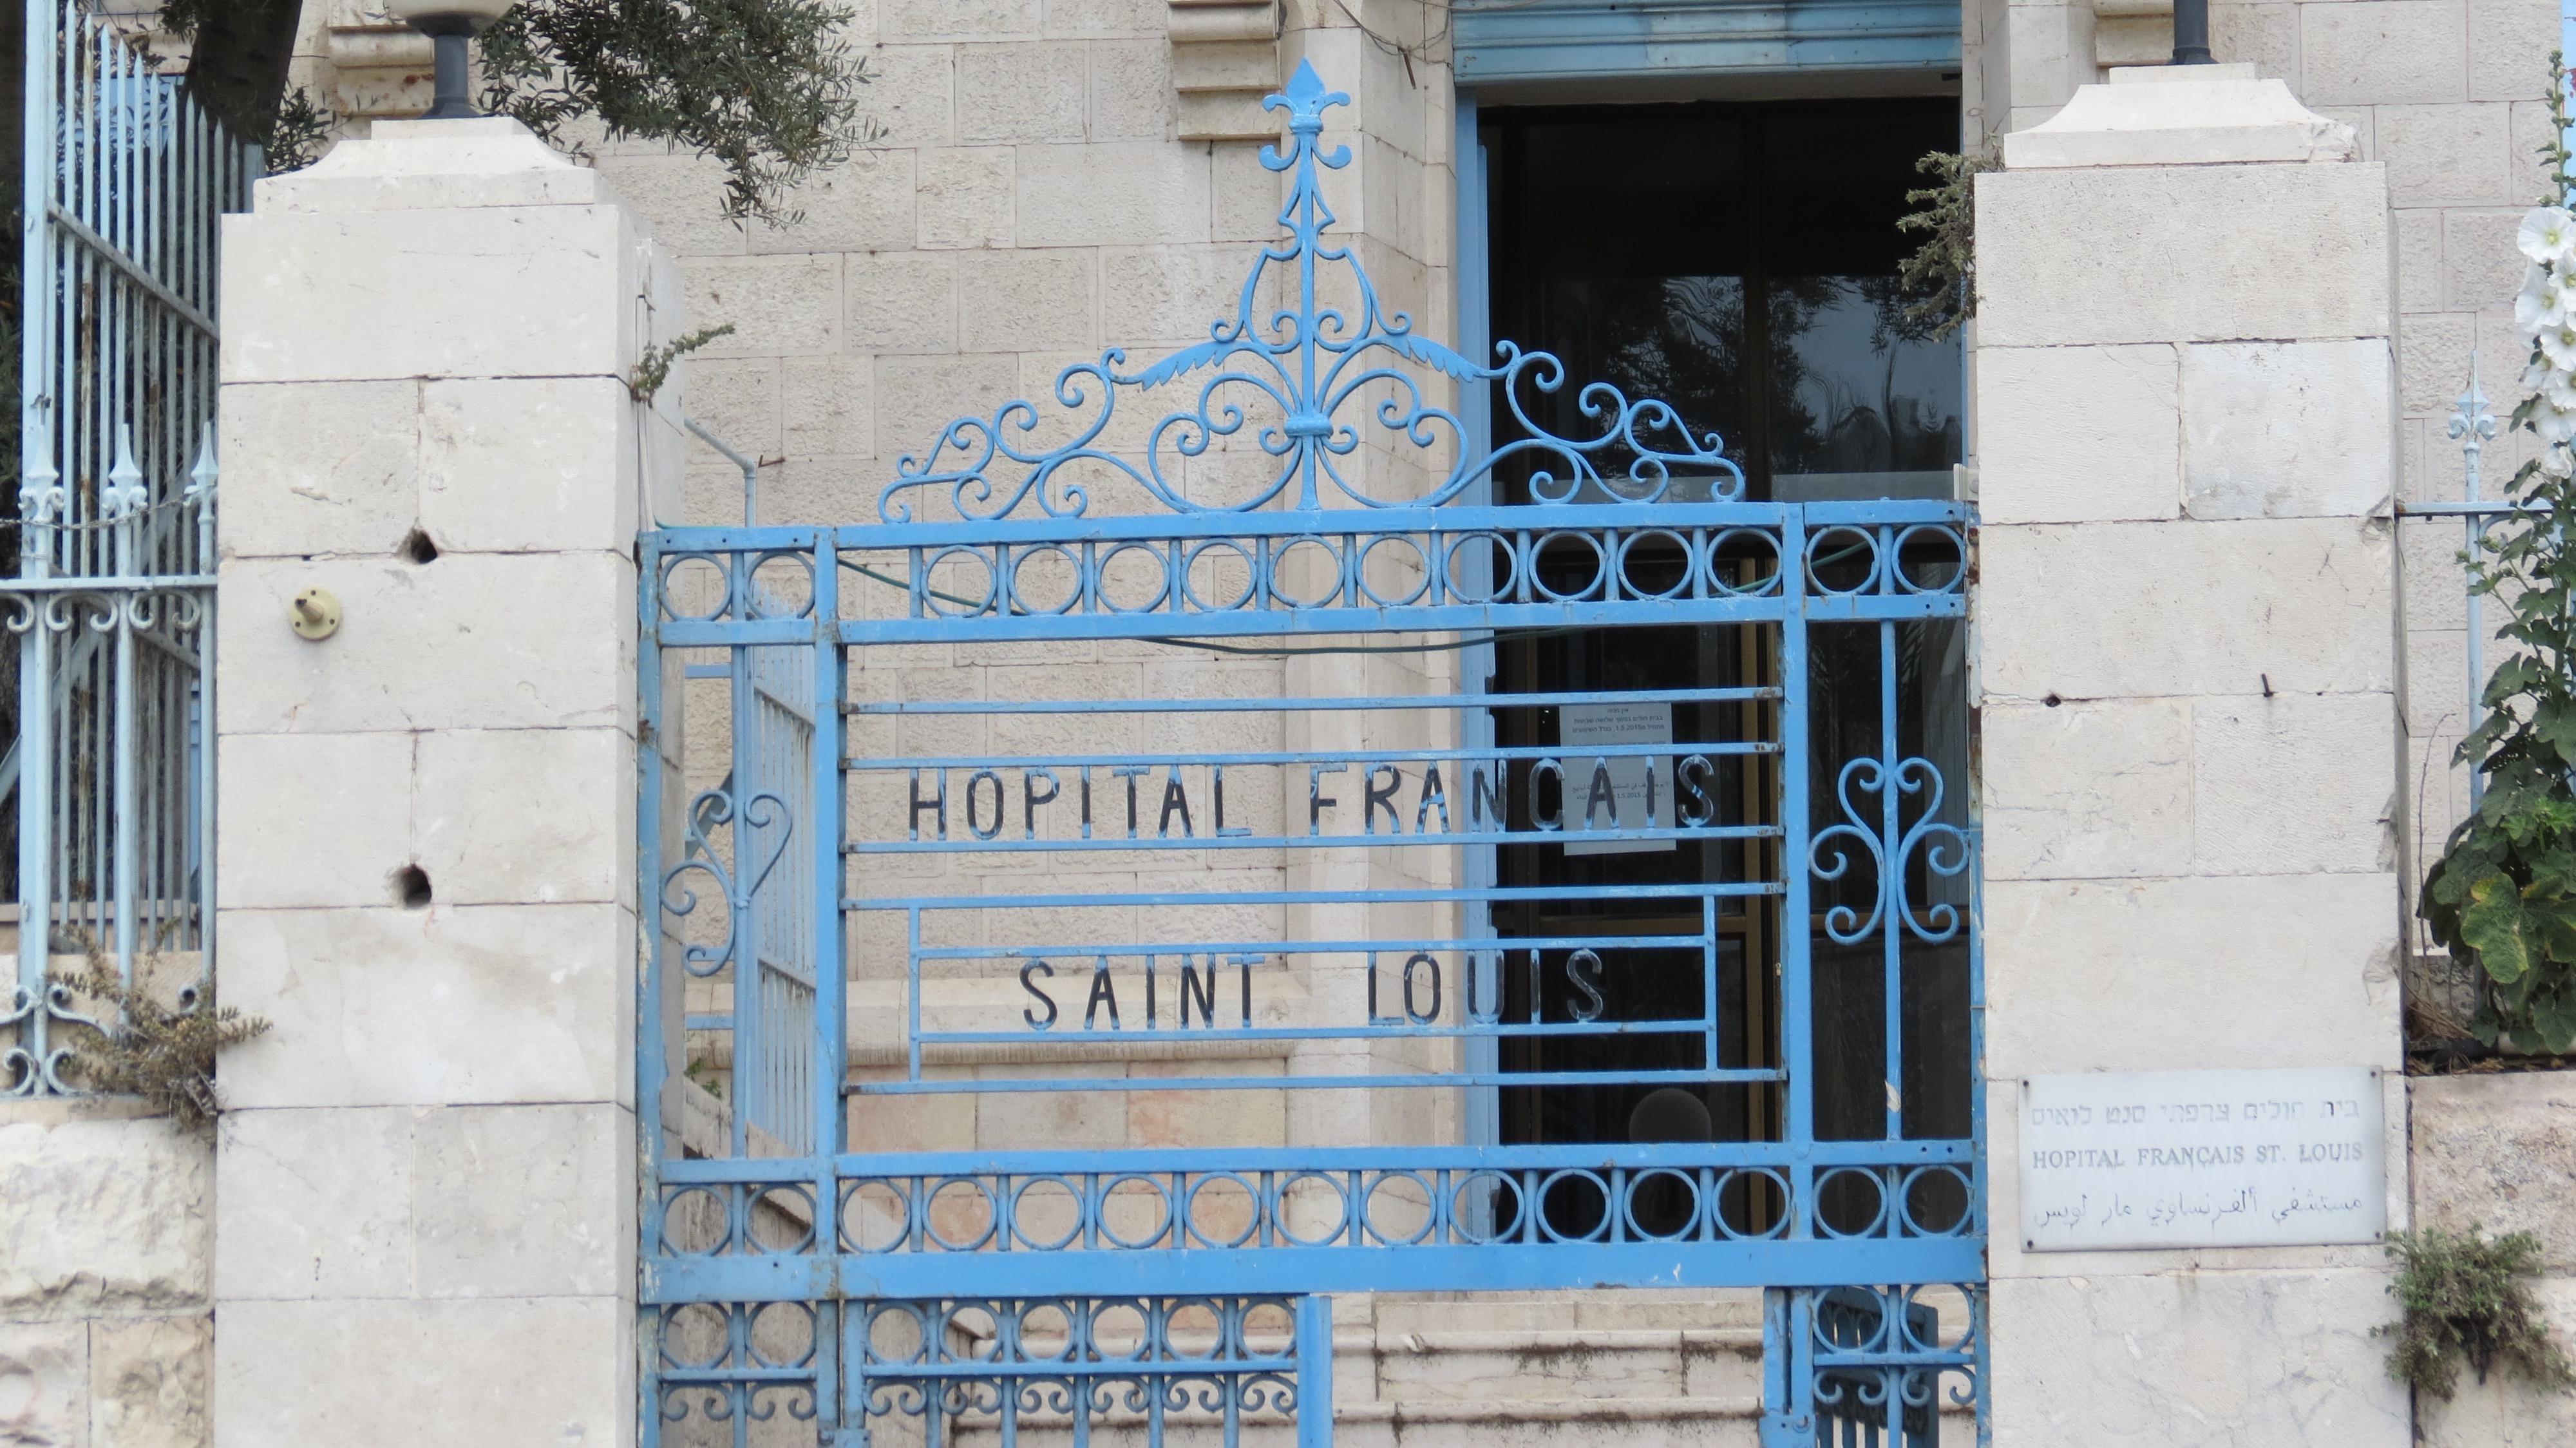 Hopital Francais Saint Louis